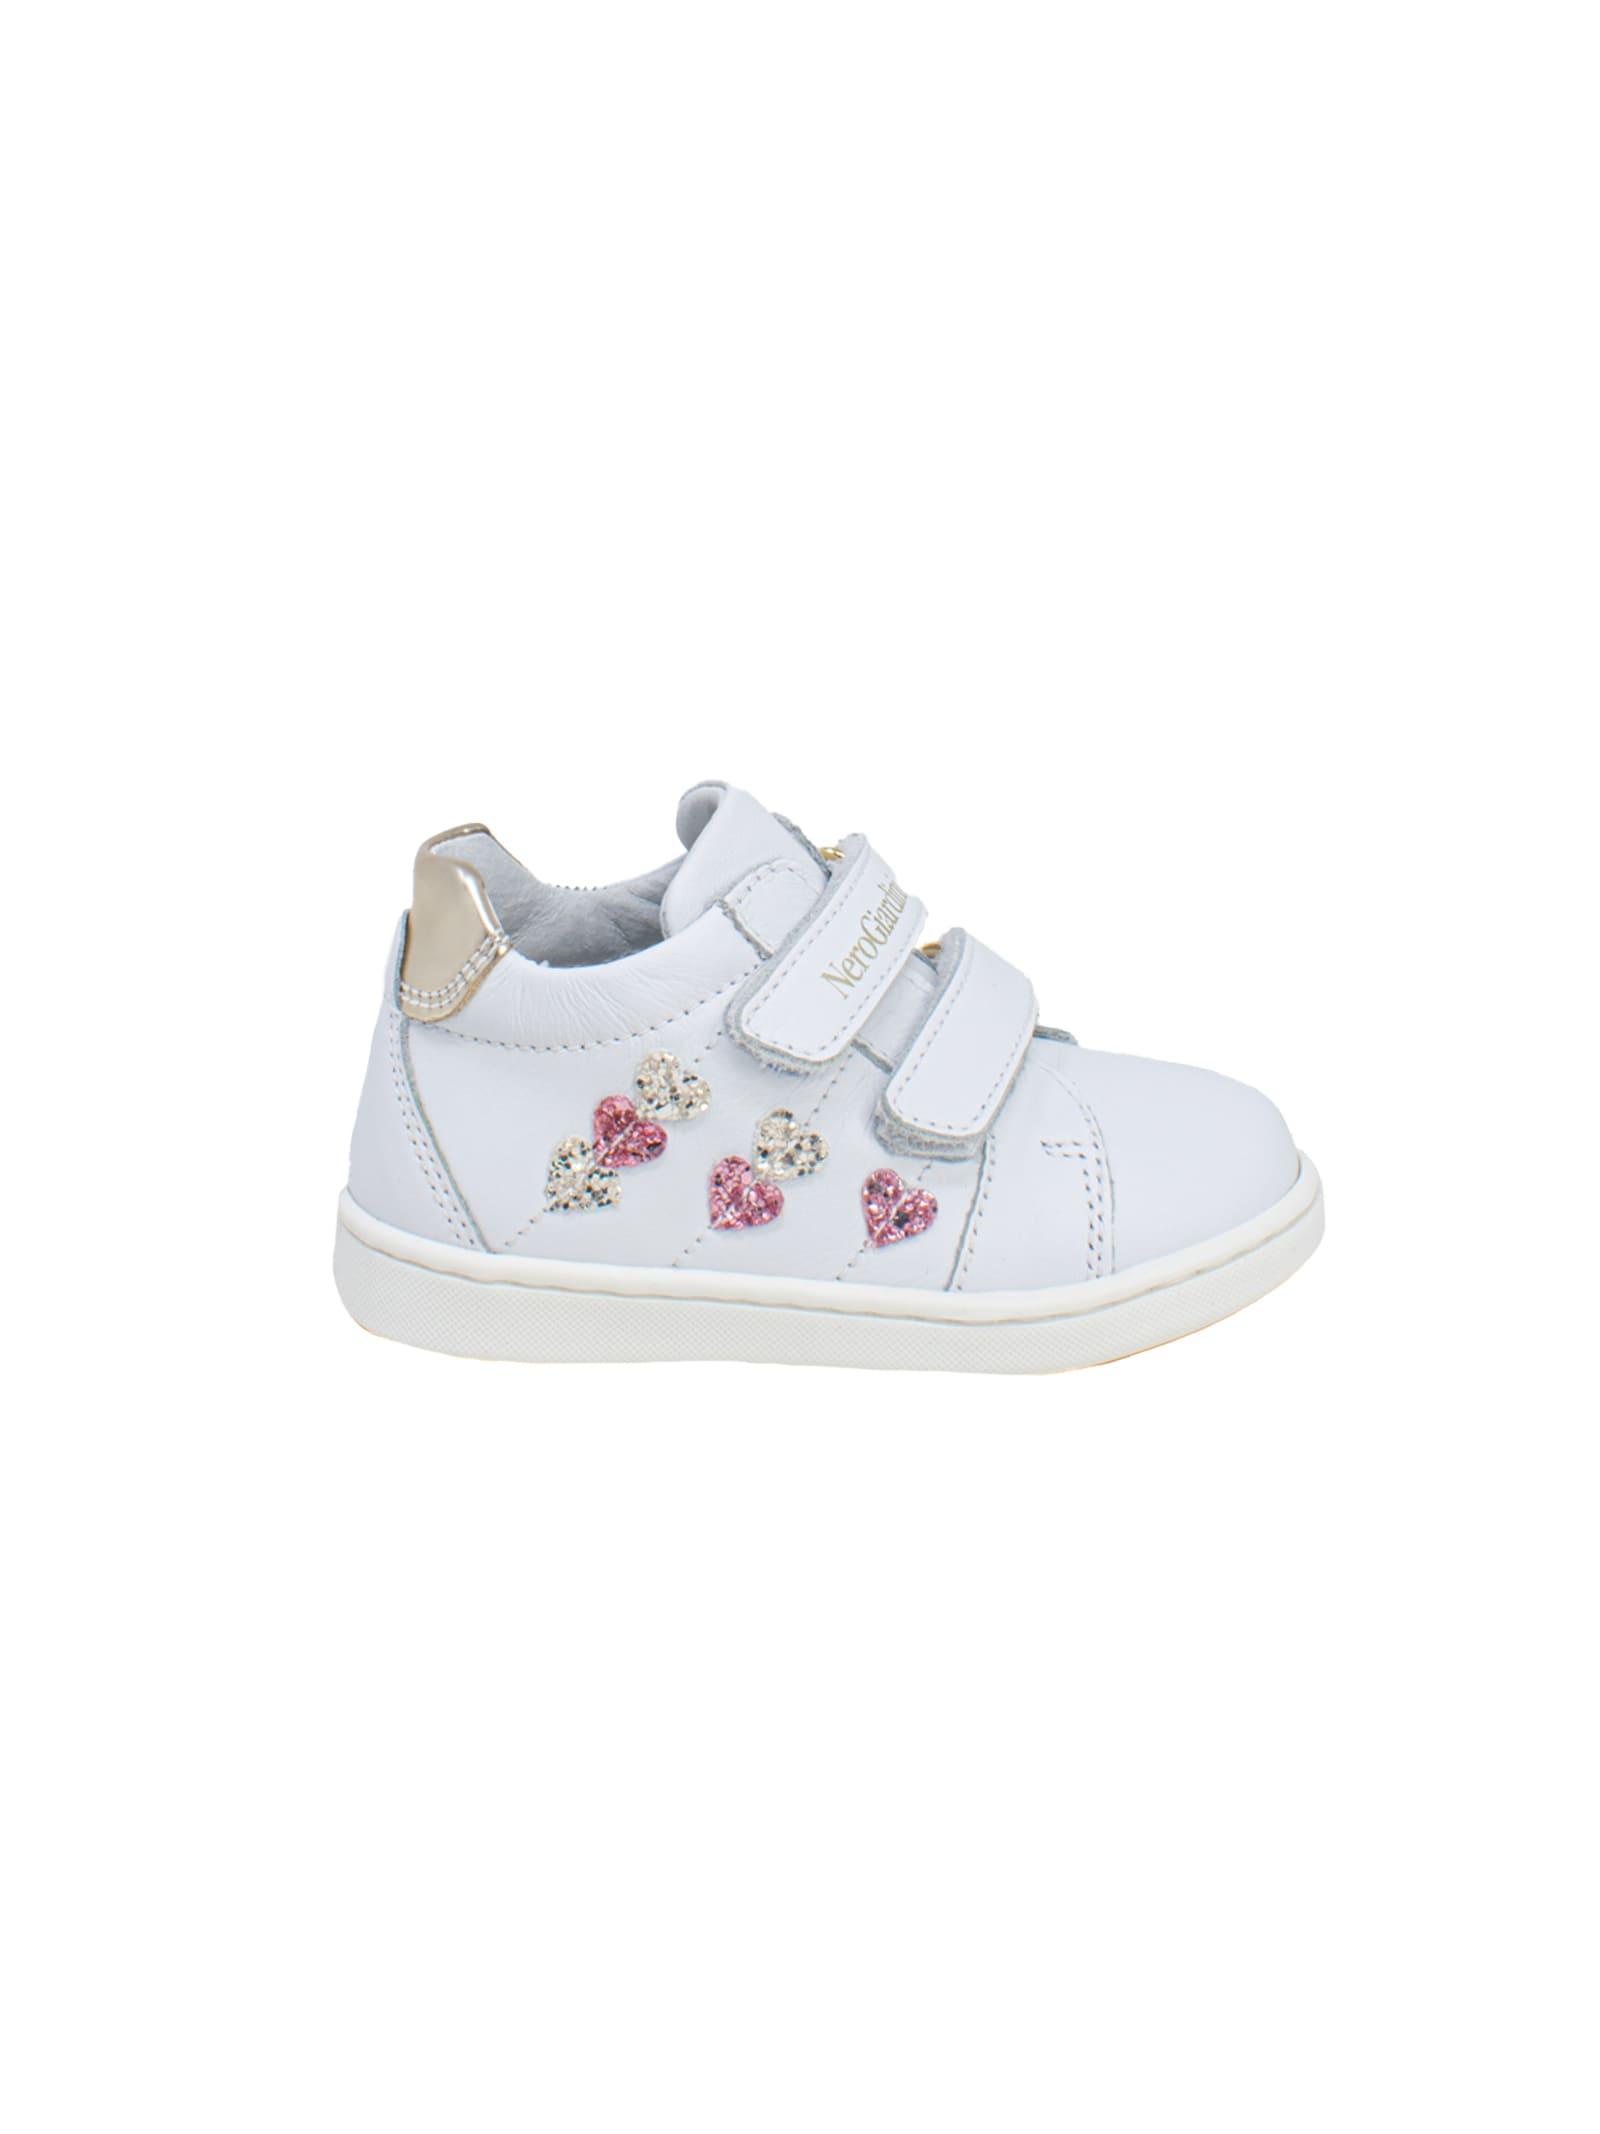 Sneakers Bambina Heart NERO GIARDINI JUNIOR | Sneakers | E118231F707